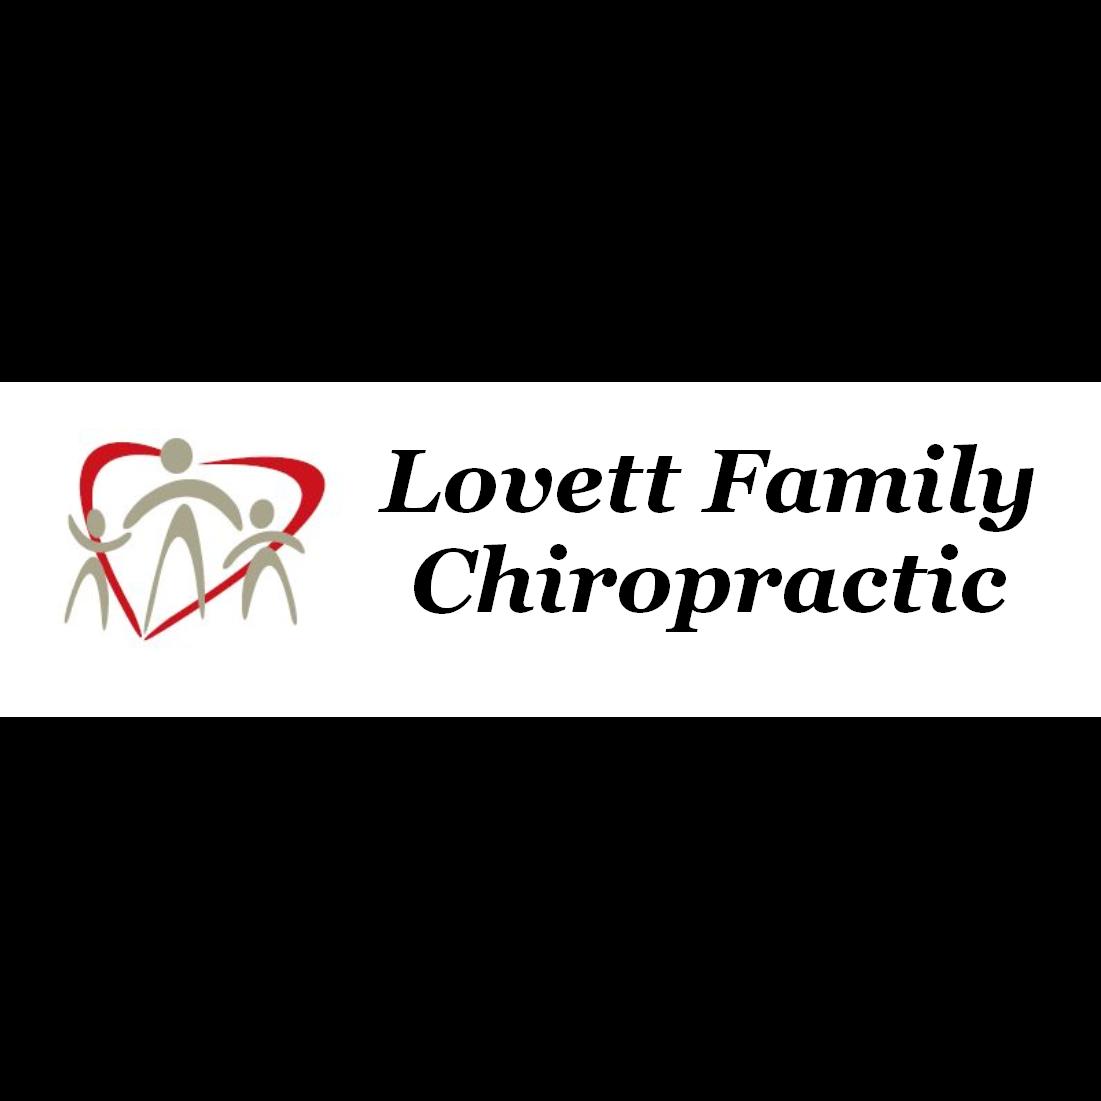 Lovett Family Chiropractic and Wellness Center